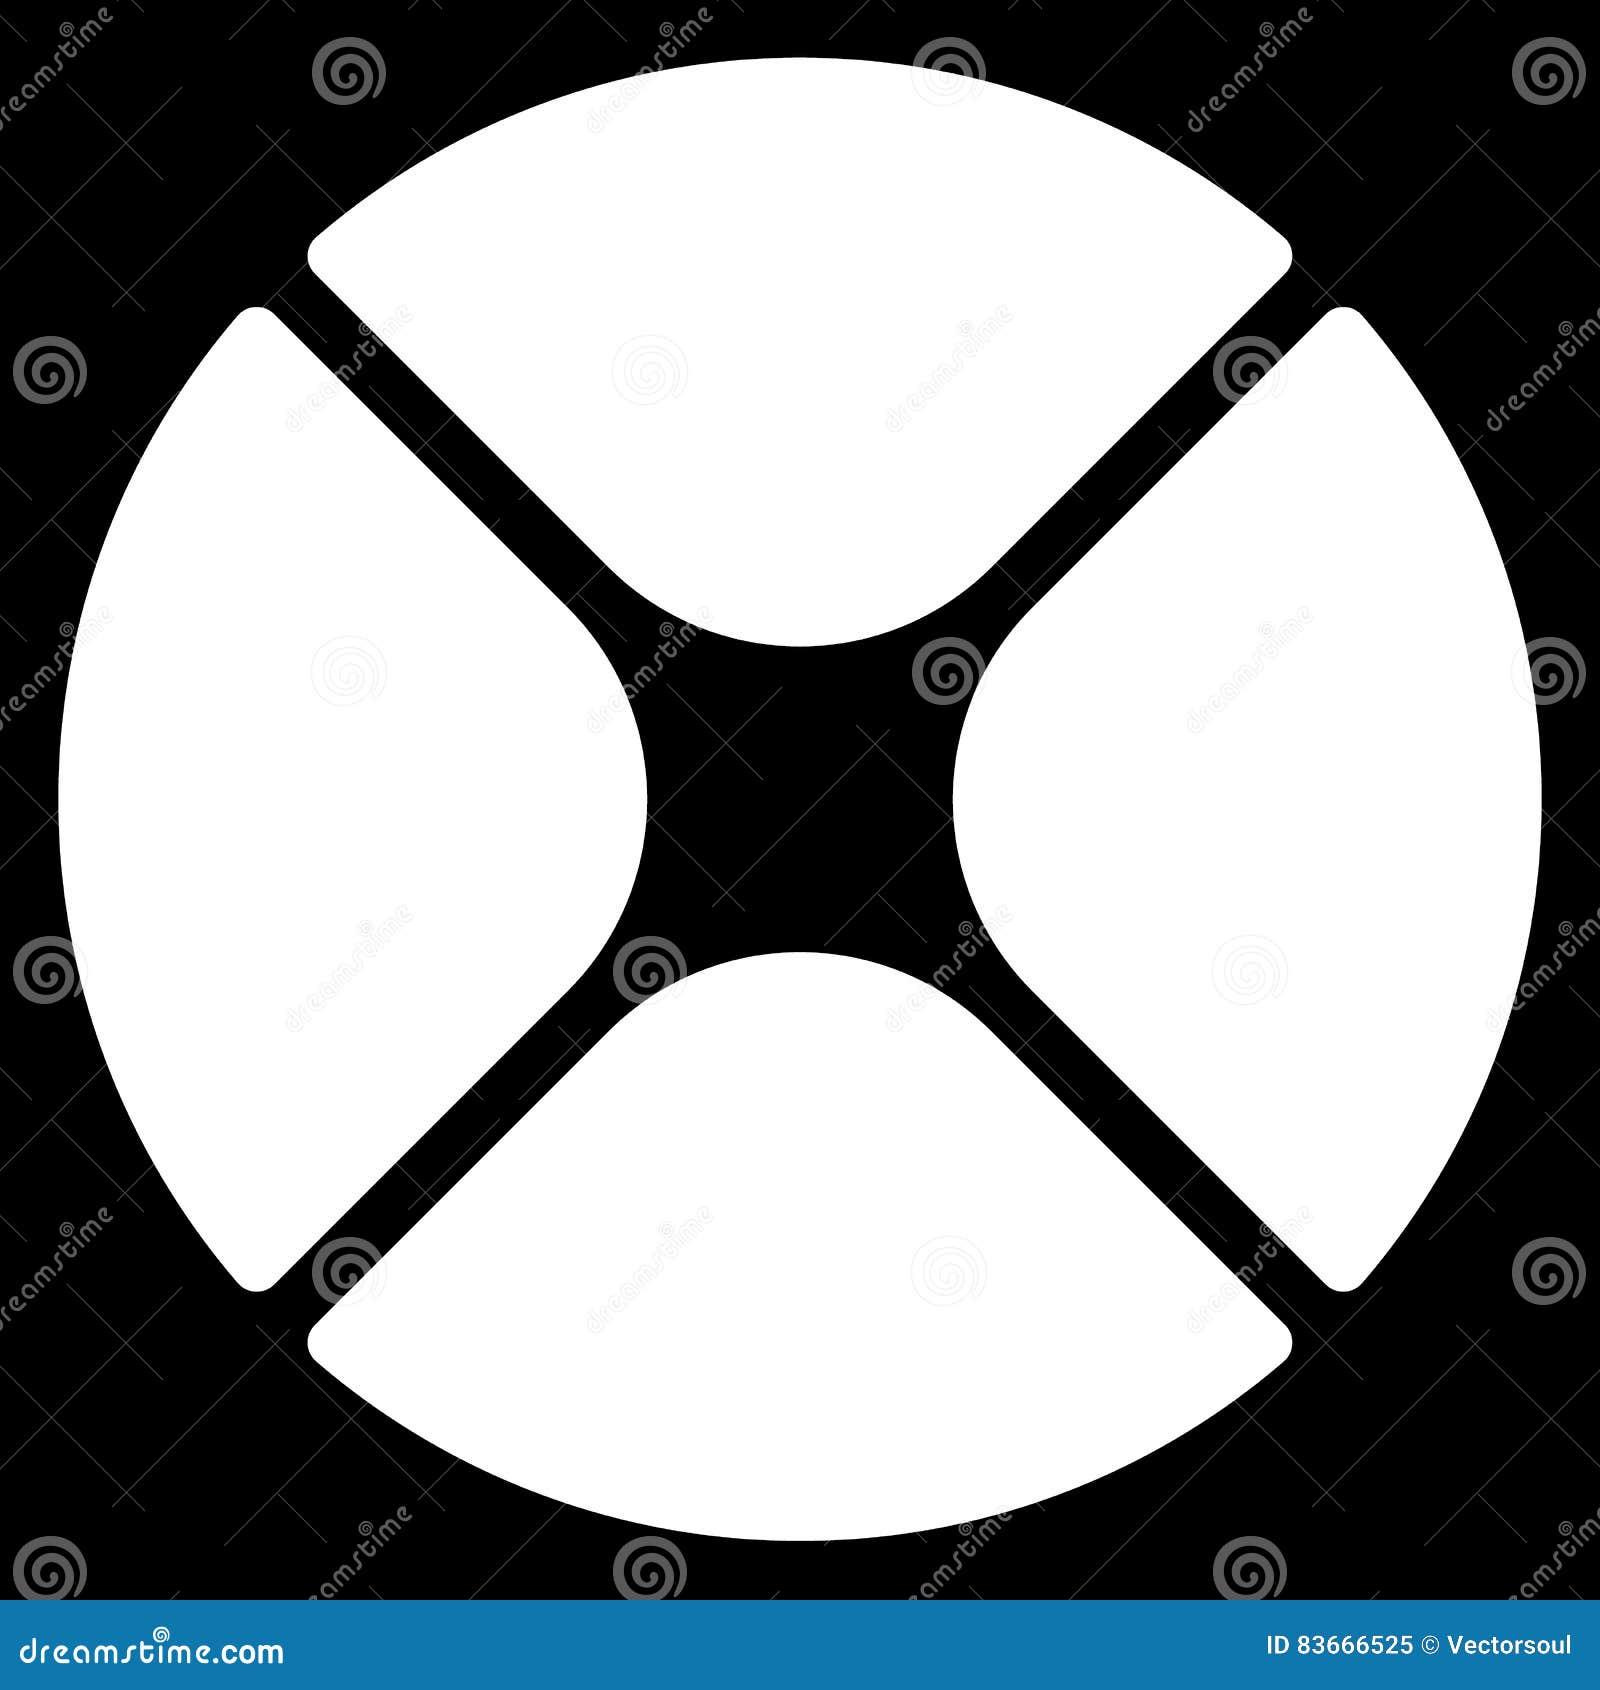 Segmented circle cross hair target symbol chart template gui download segmented circle cross hair target symbol chart template gui stock vector maxwellsz